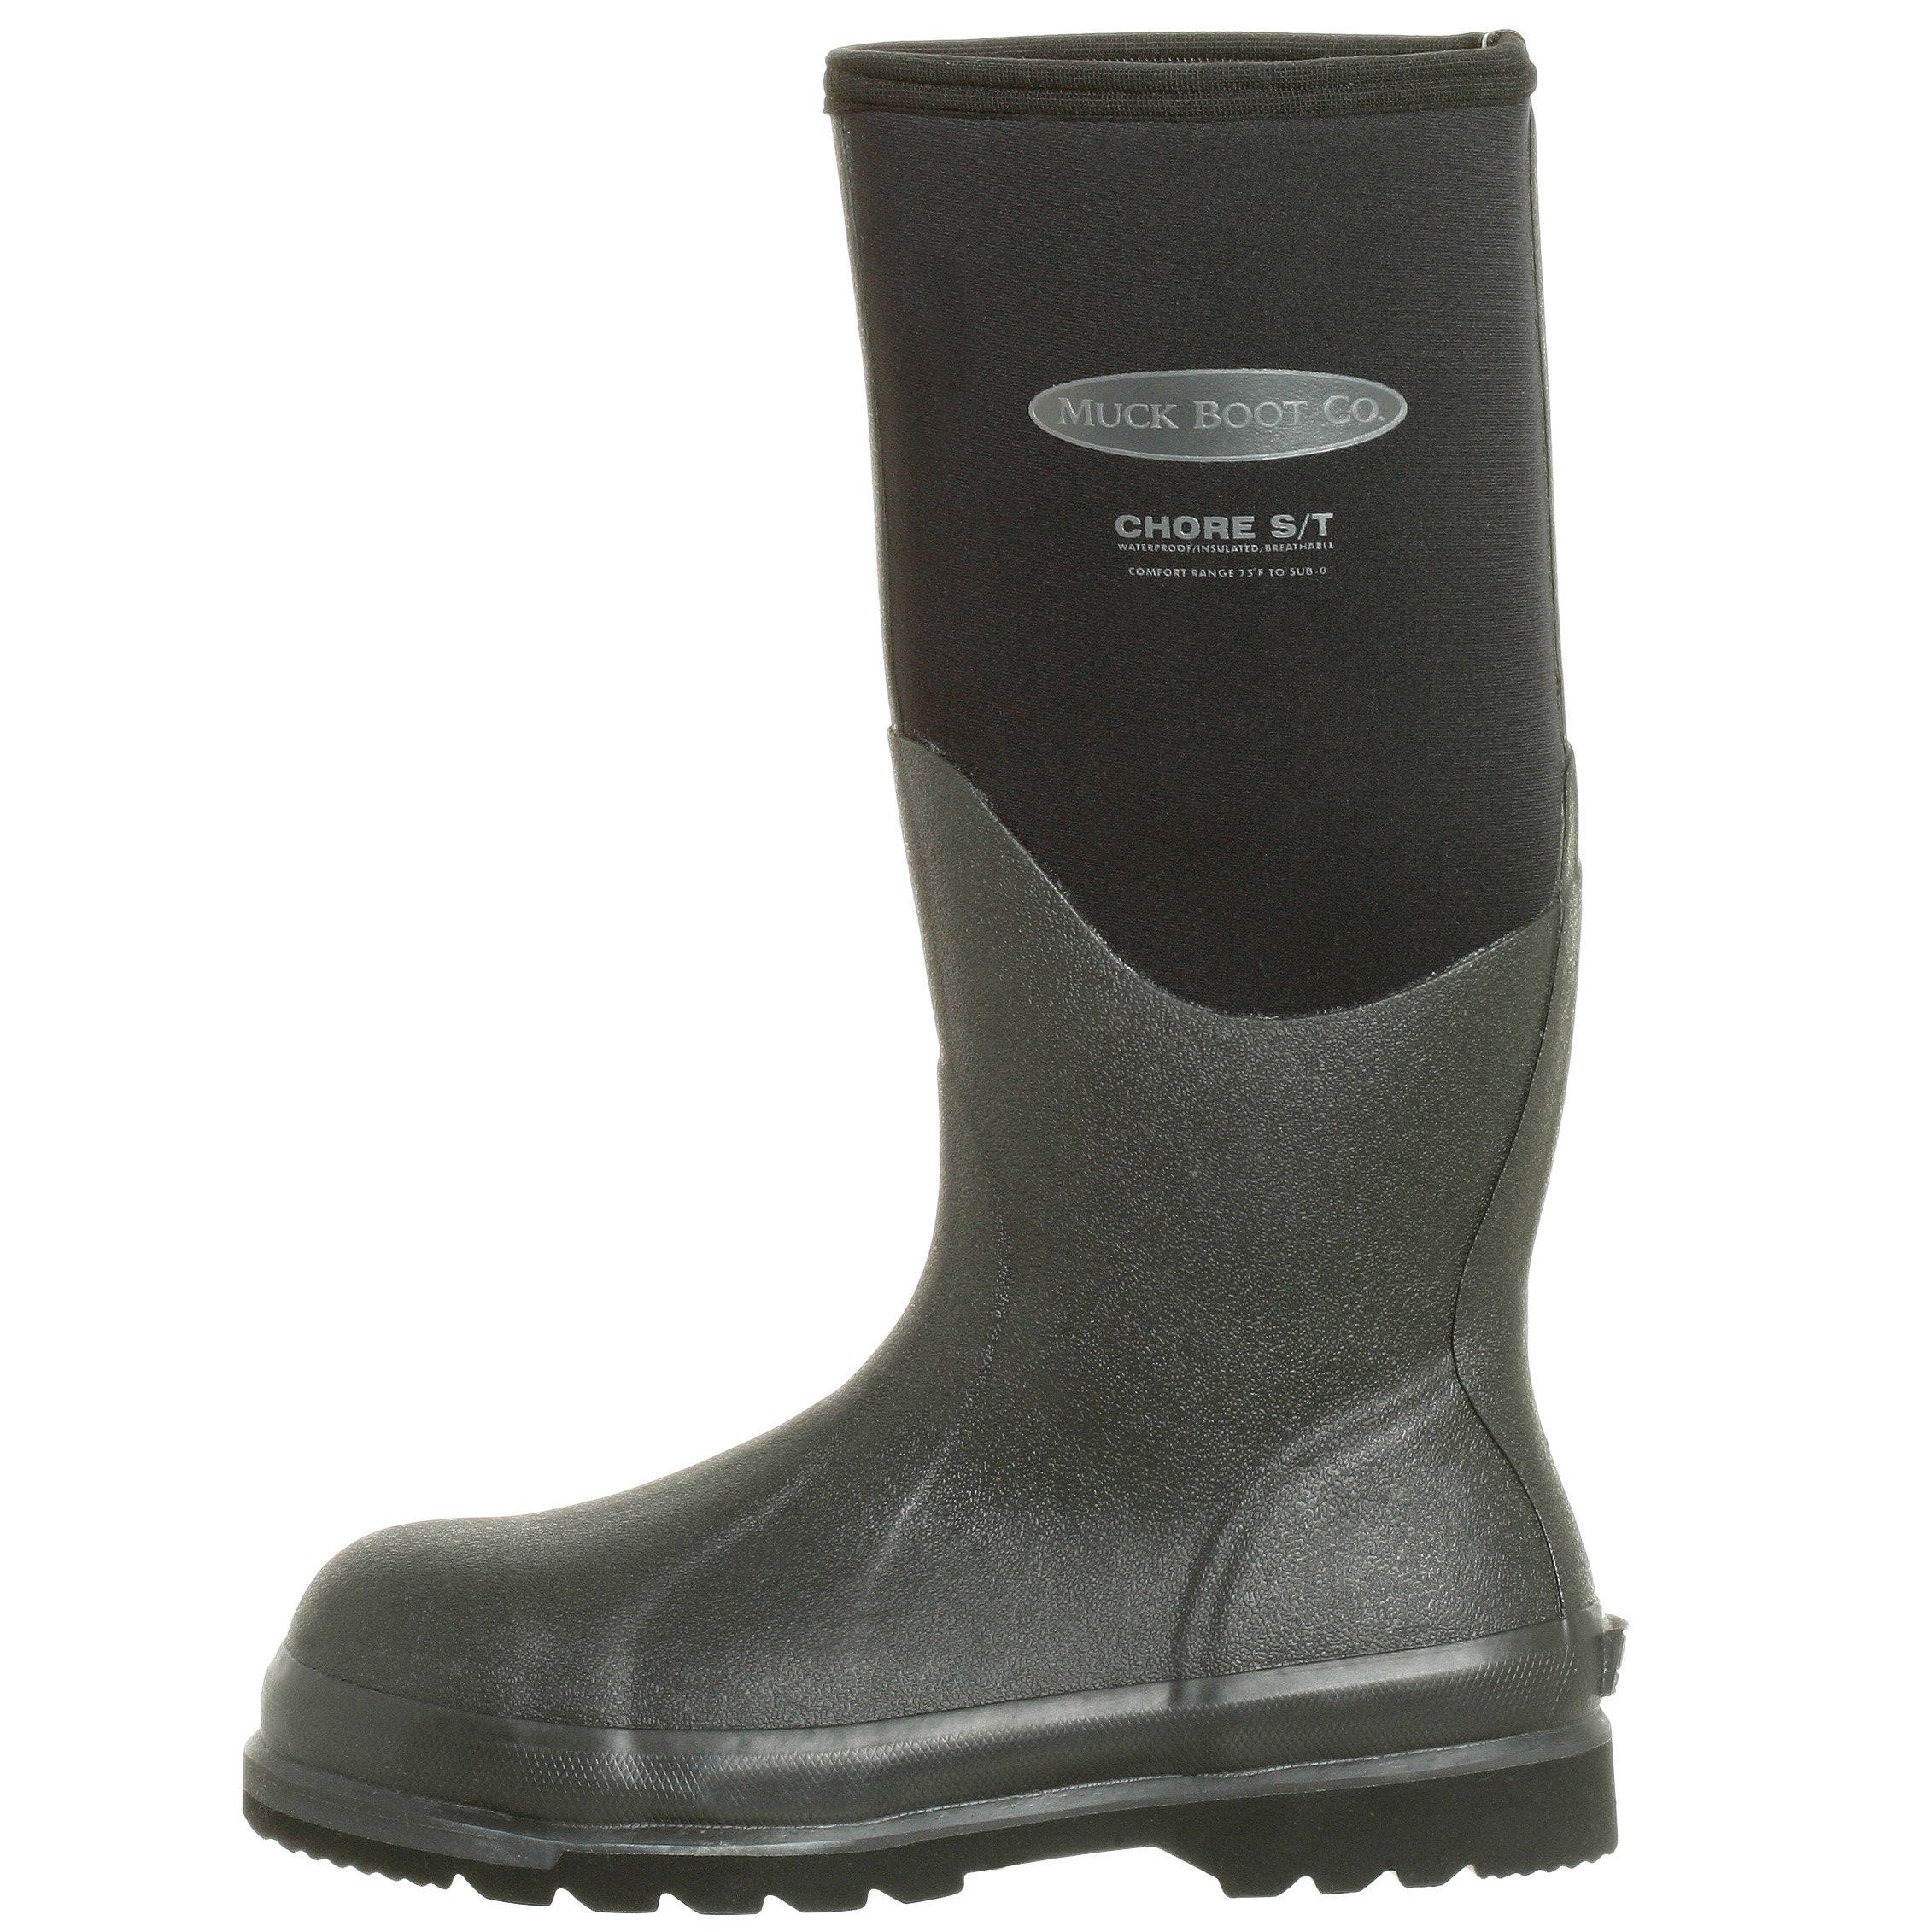 The Original MuckBoots Adult Chore Hi Boot Steel Toe,Black,Men's 12 M/Women's 13 M by Muck Boot (Image #5)